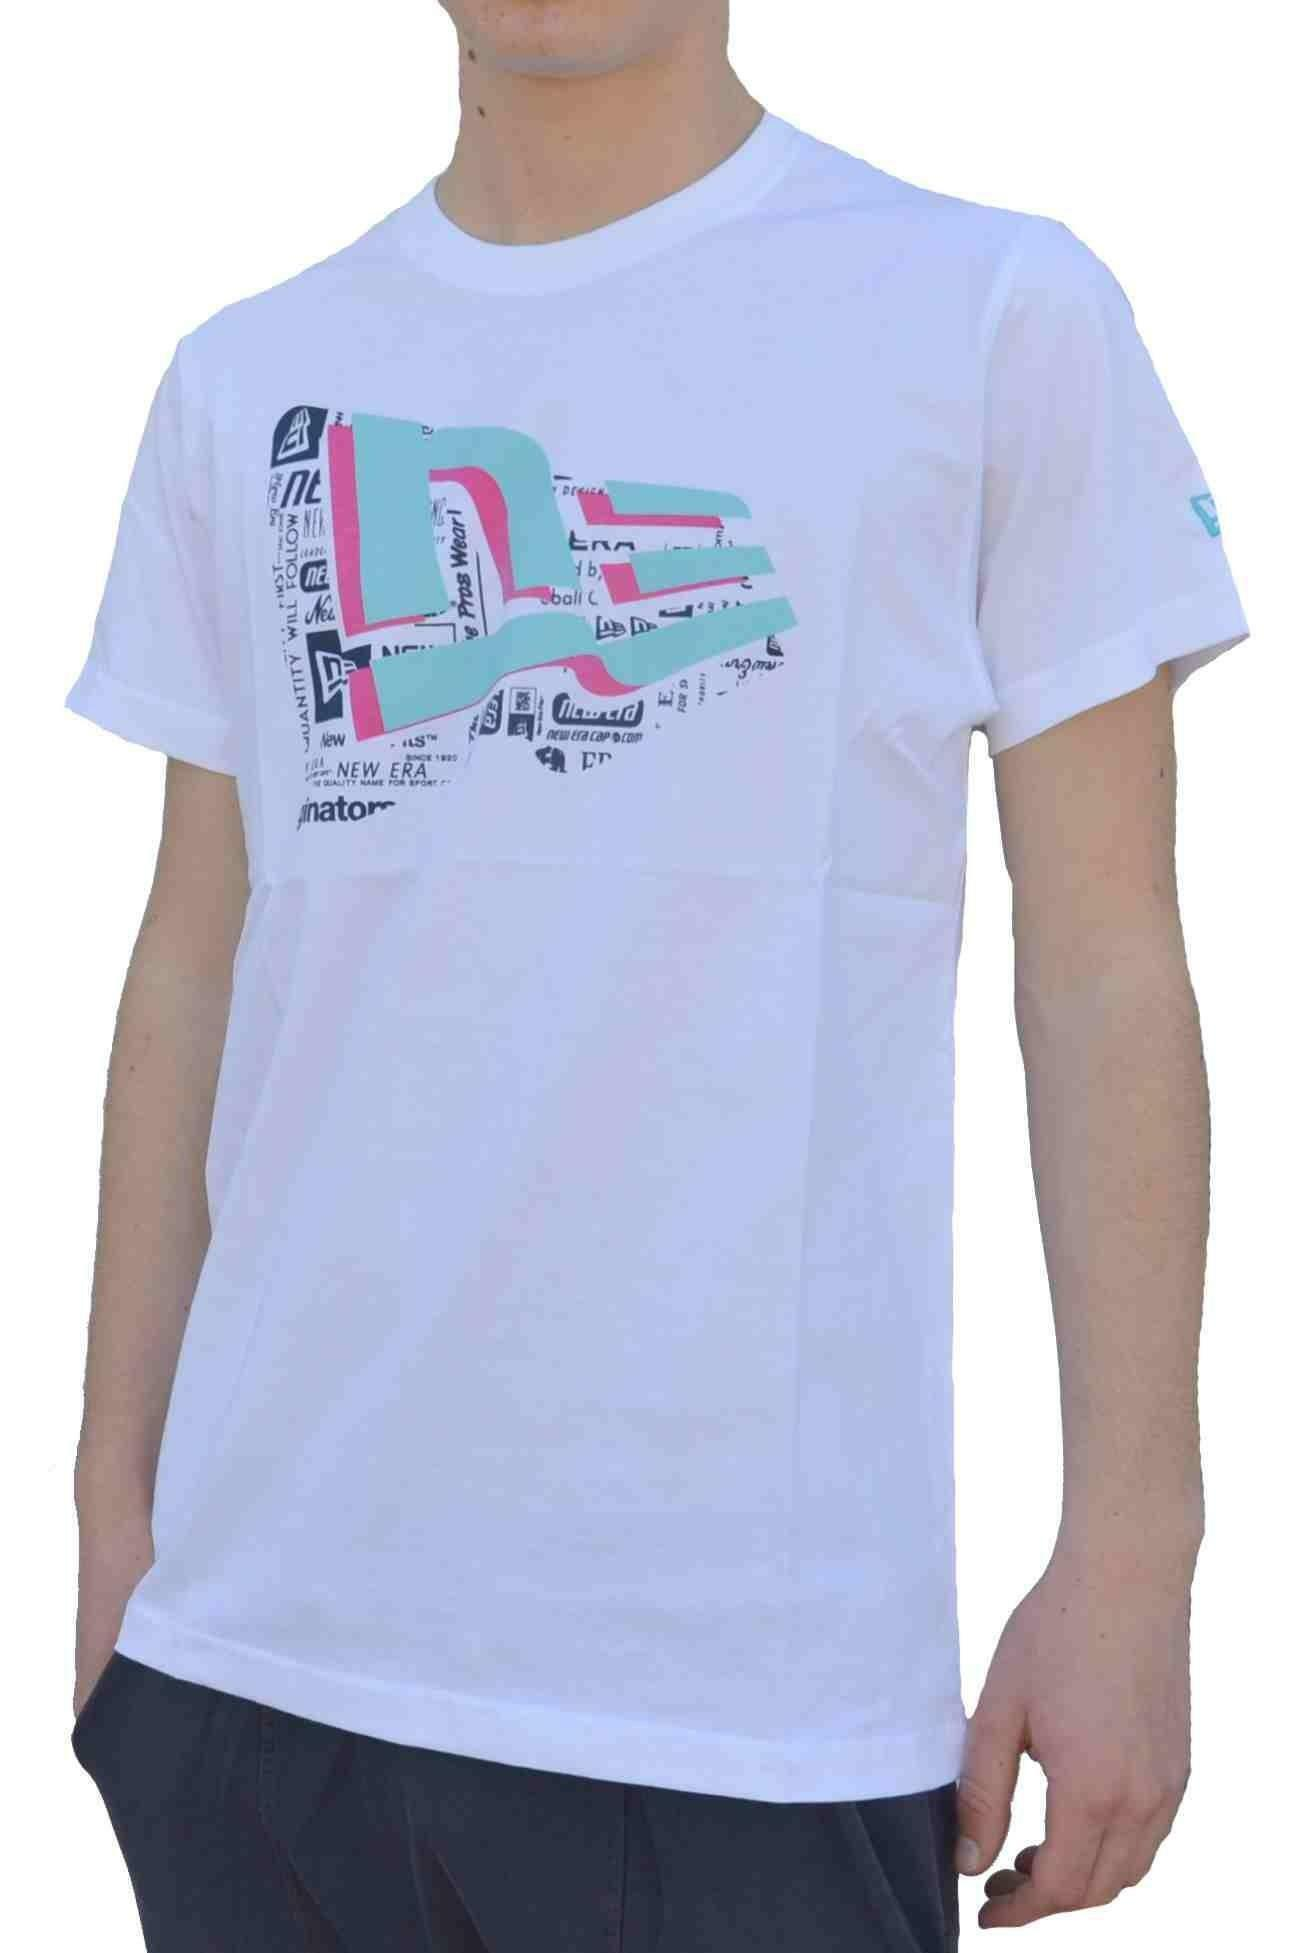 new era flag story t-shirt uomo bianca